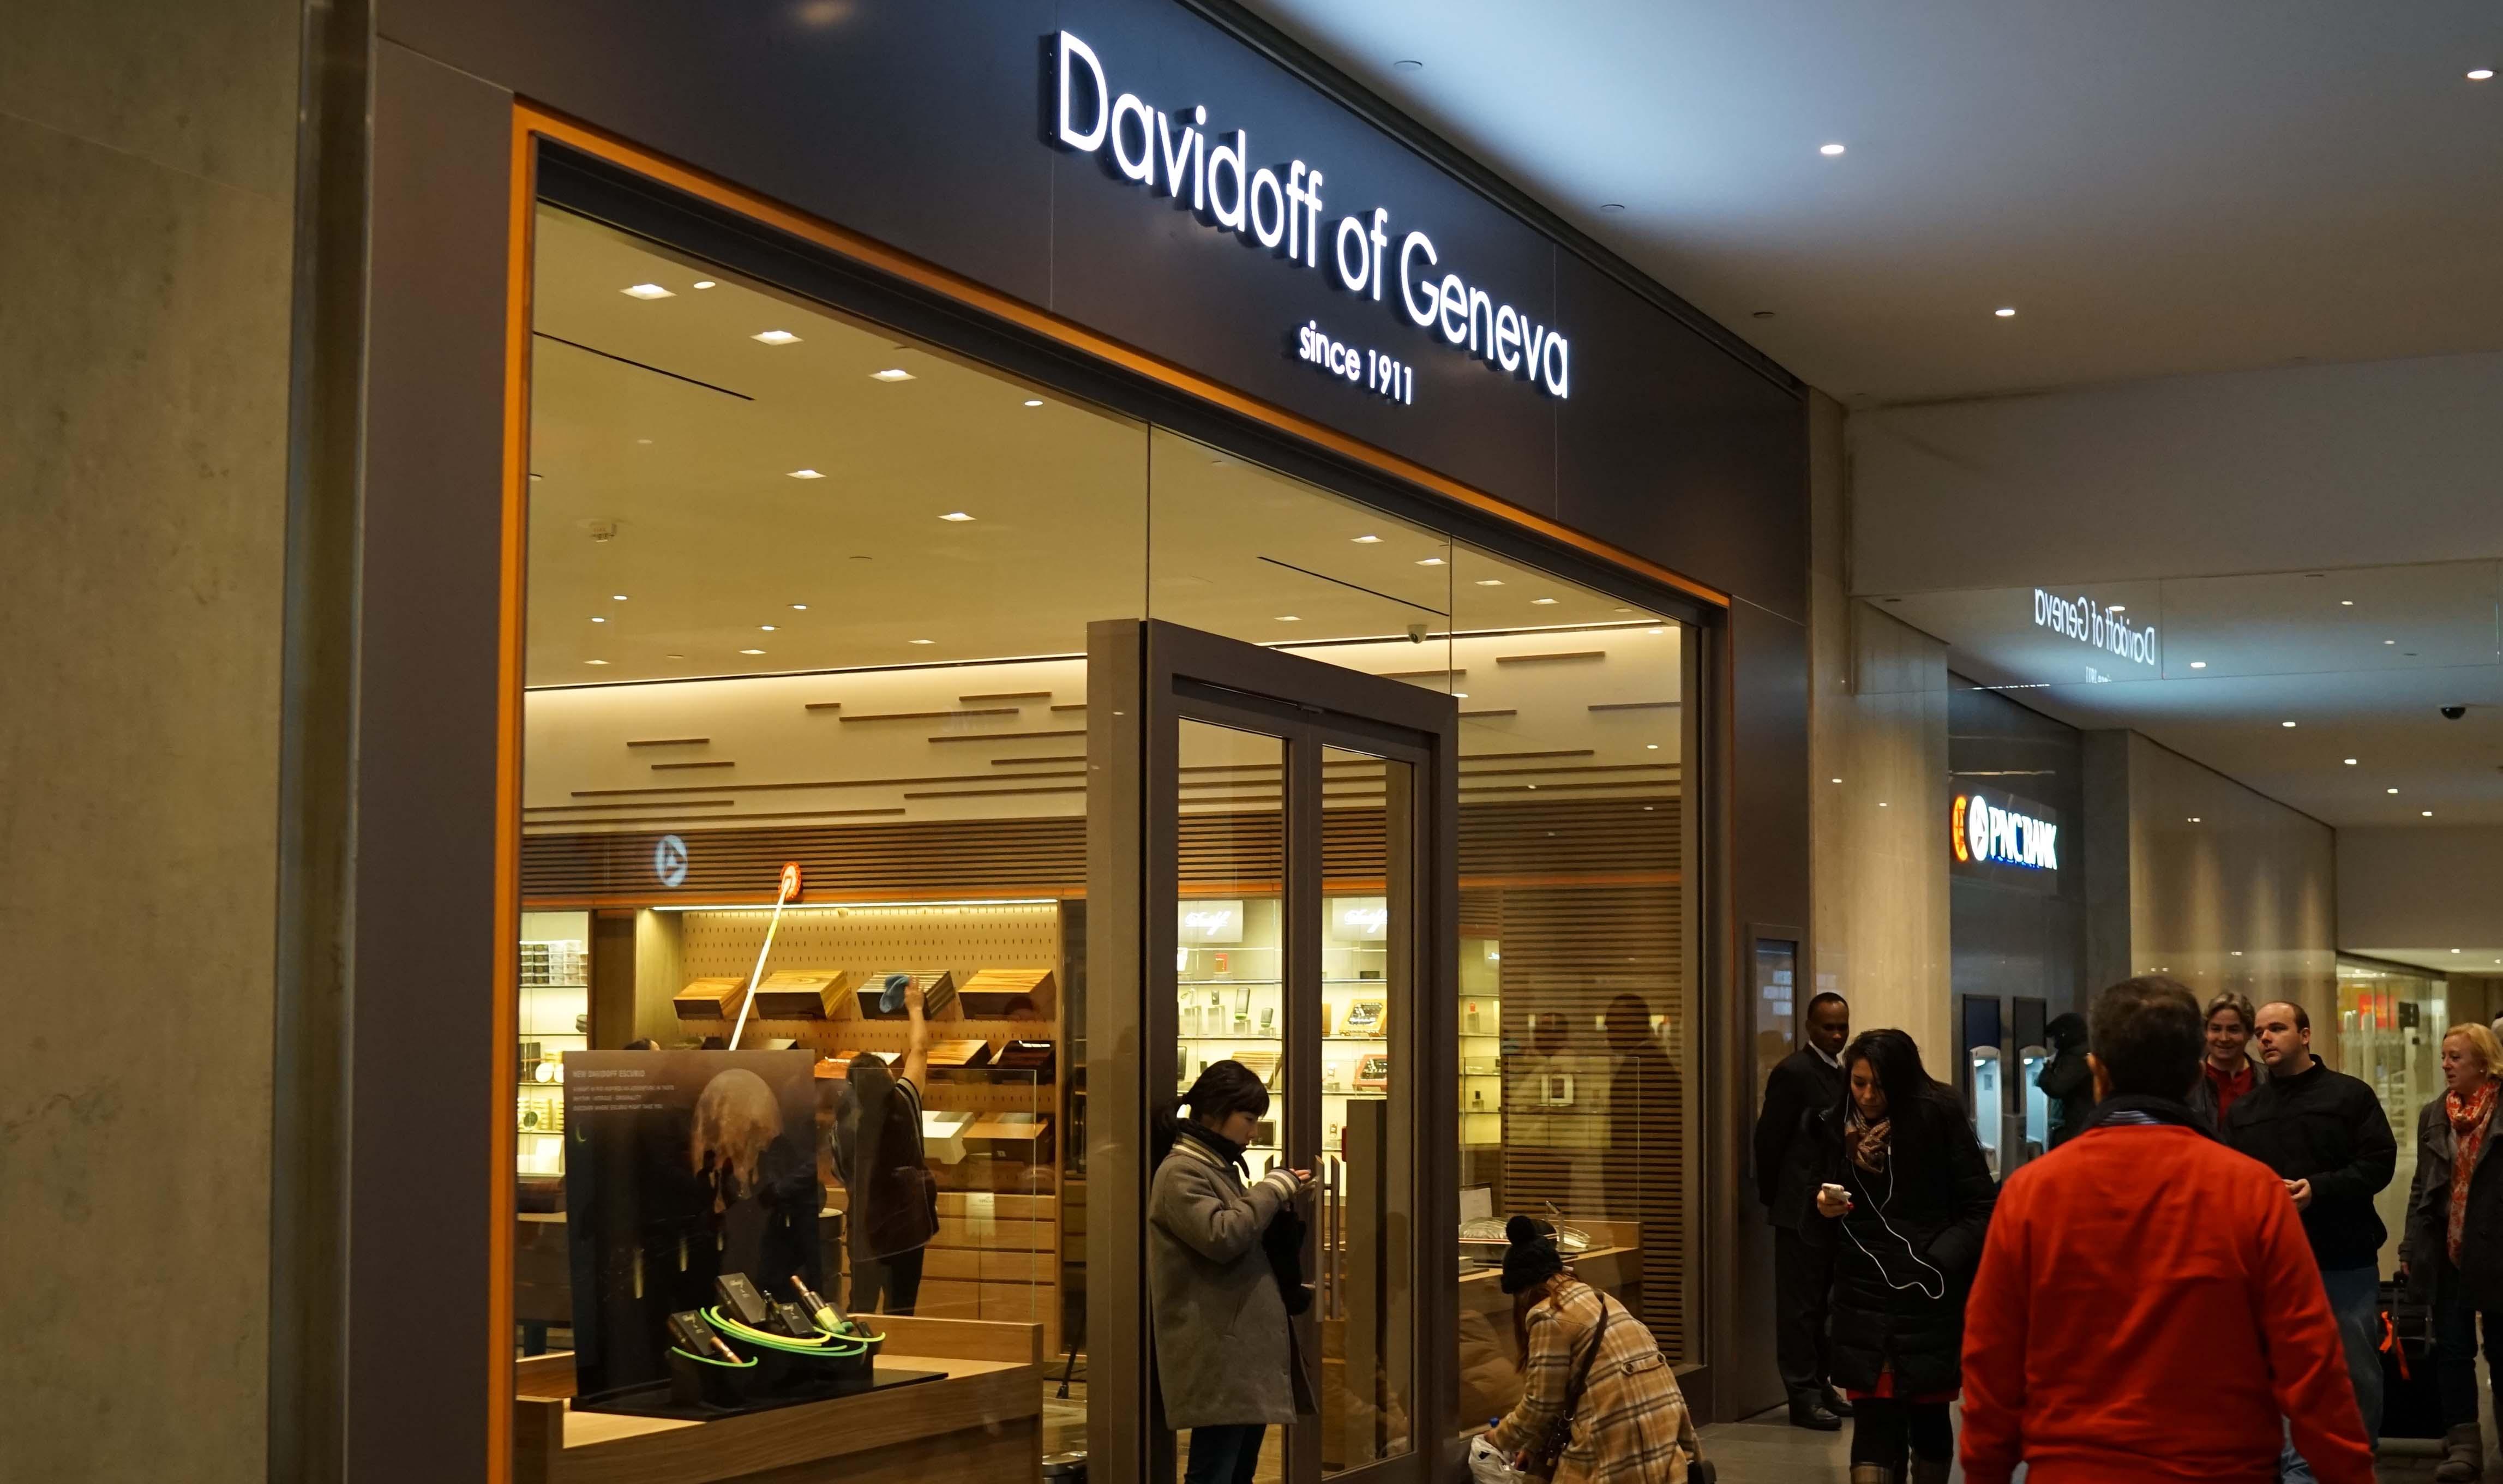 Davidoff of Geneva inside storefront